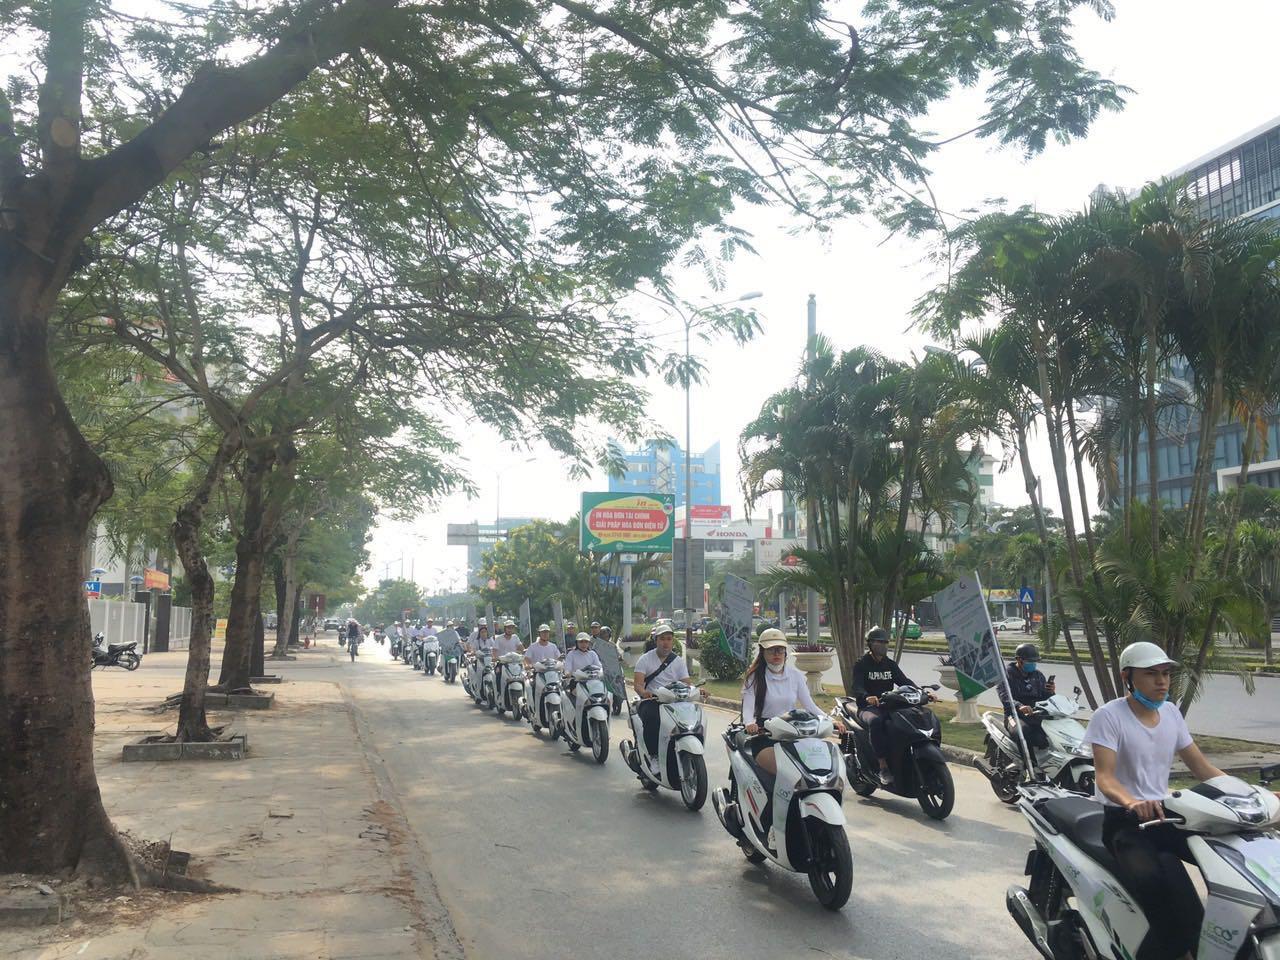 roadshow-gioi-thieu-phan-khu-eco-forestina-phu-xanh-duong-pho-hai-phongdocx-1577447050625